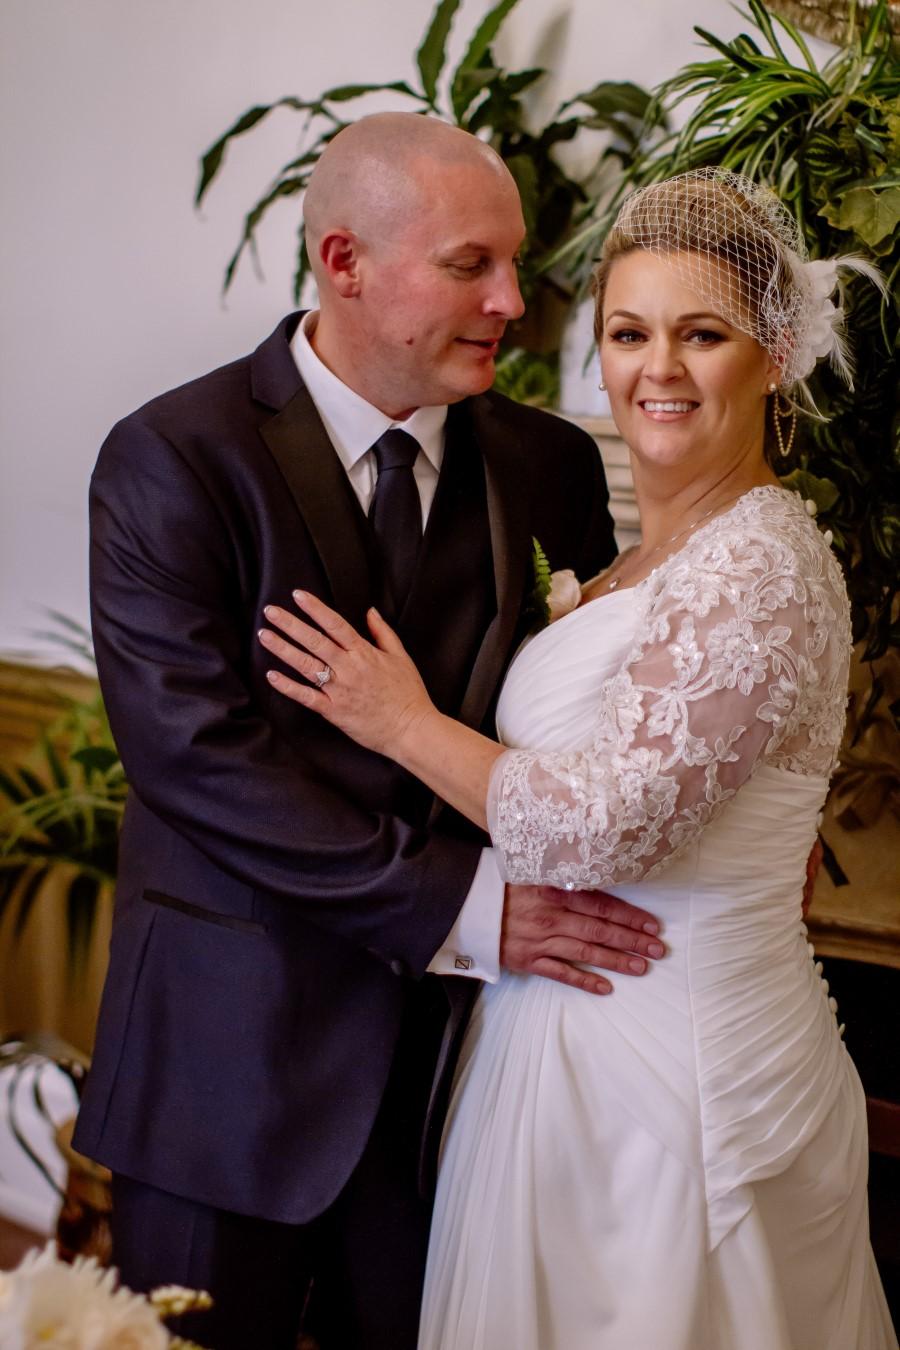 nz_wedding_st_leonards_mchughs-668